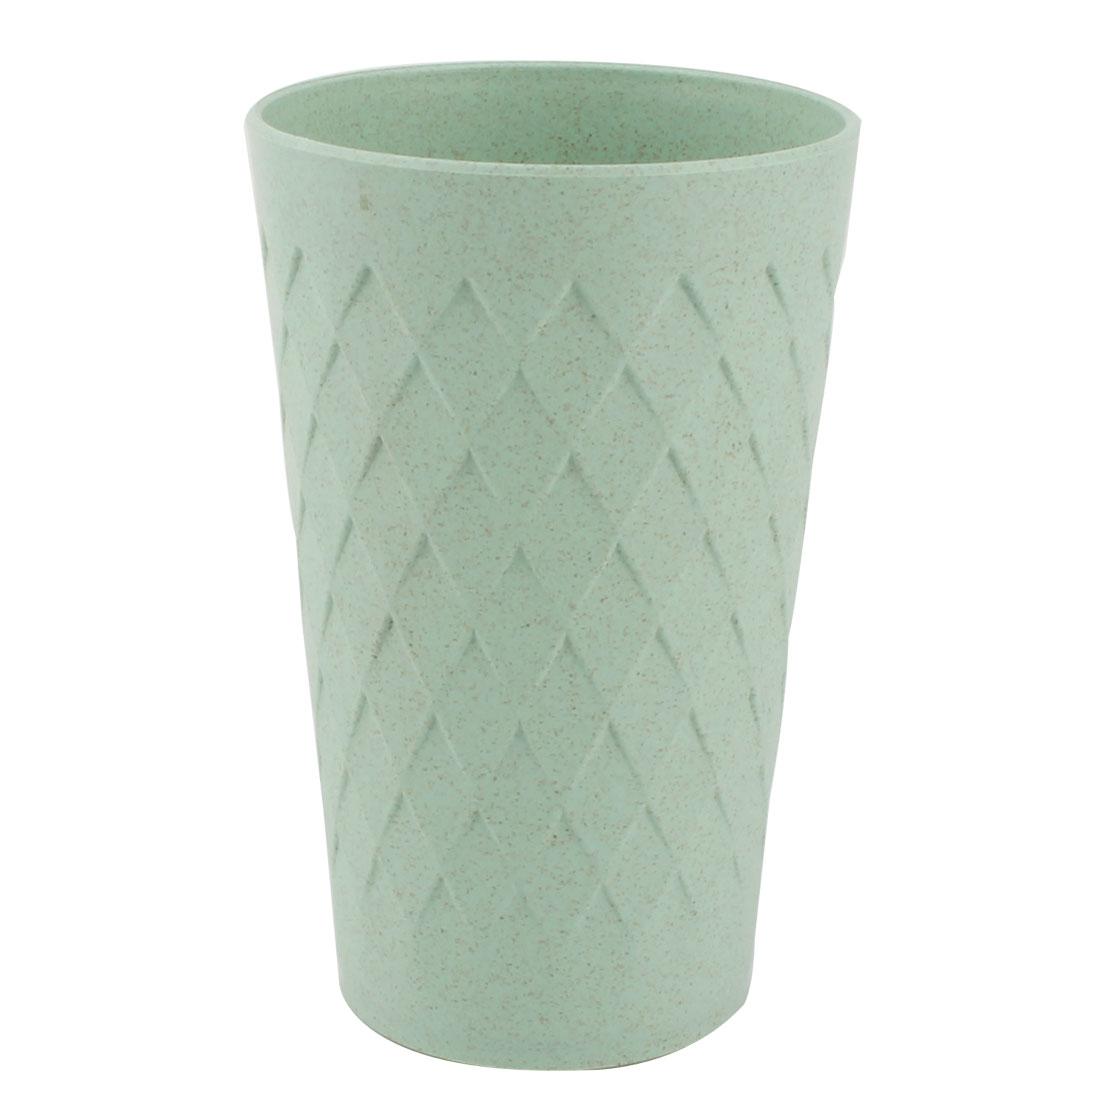 Household Office Plastic Rhombus Pattern Water Tea Milk Coffee Drinking Holder Cup Green